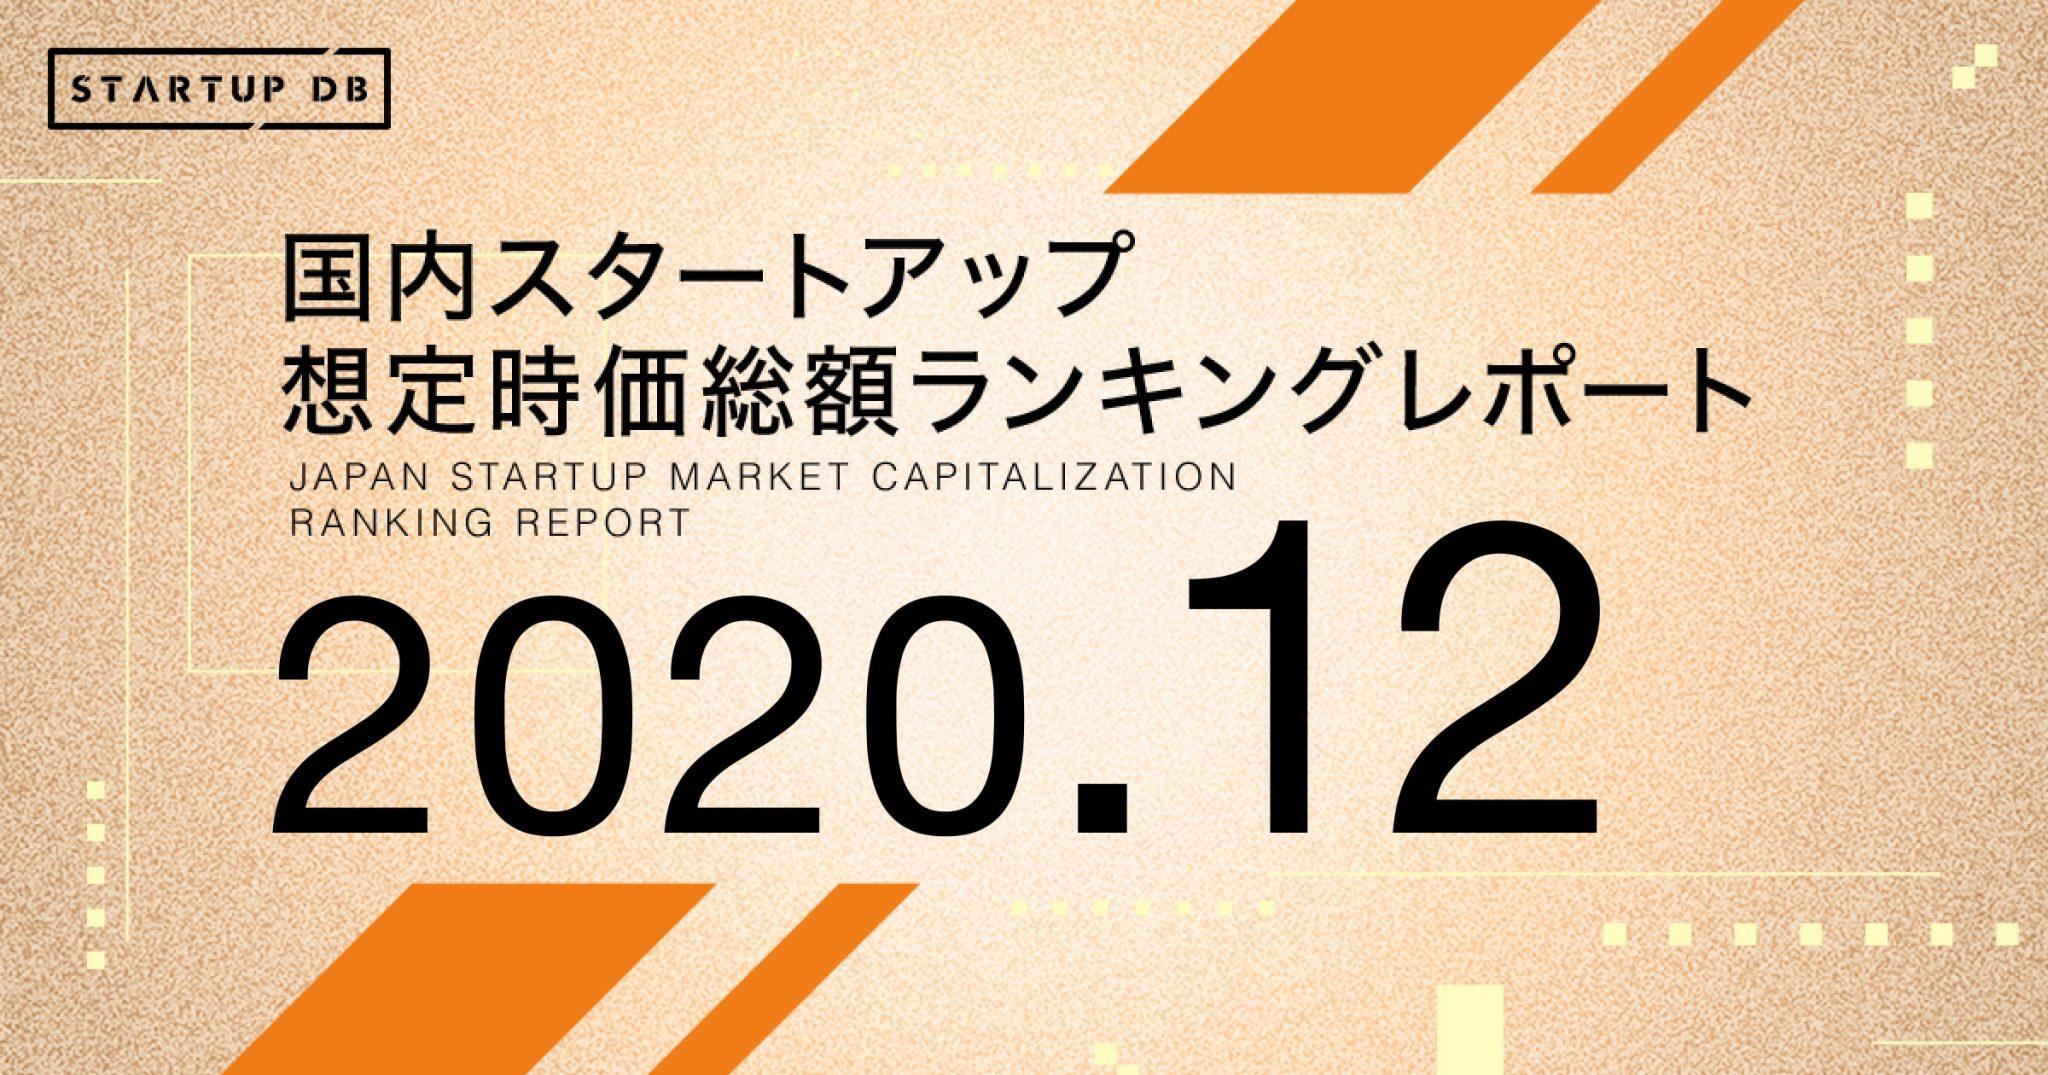 【STARTUP DB】調査結果 国内スタートアップ想定時価総額ランキング(2020年12月)